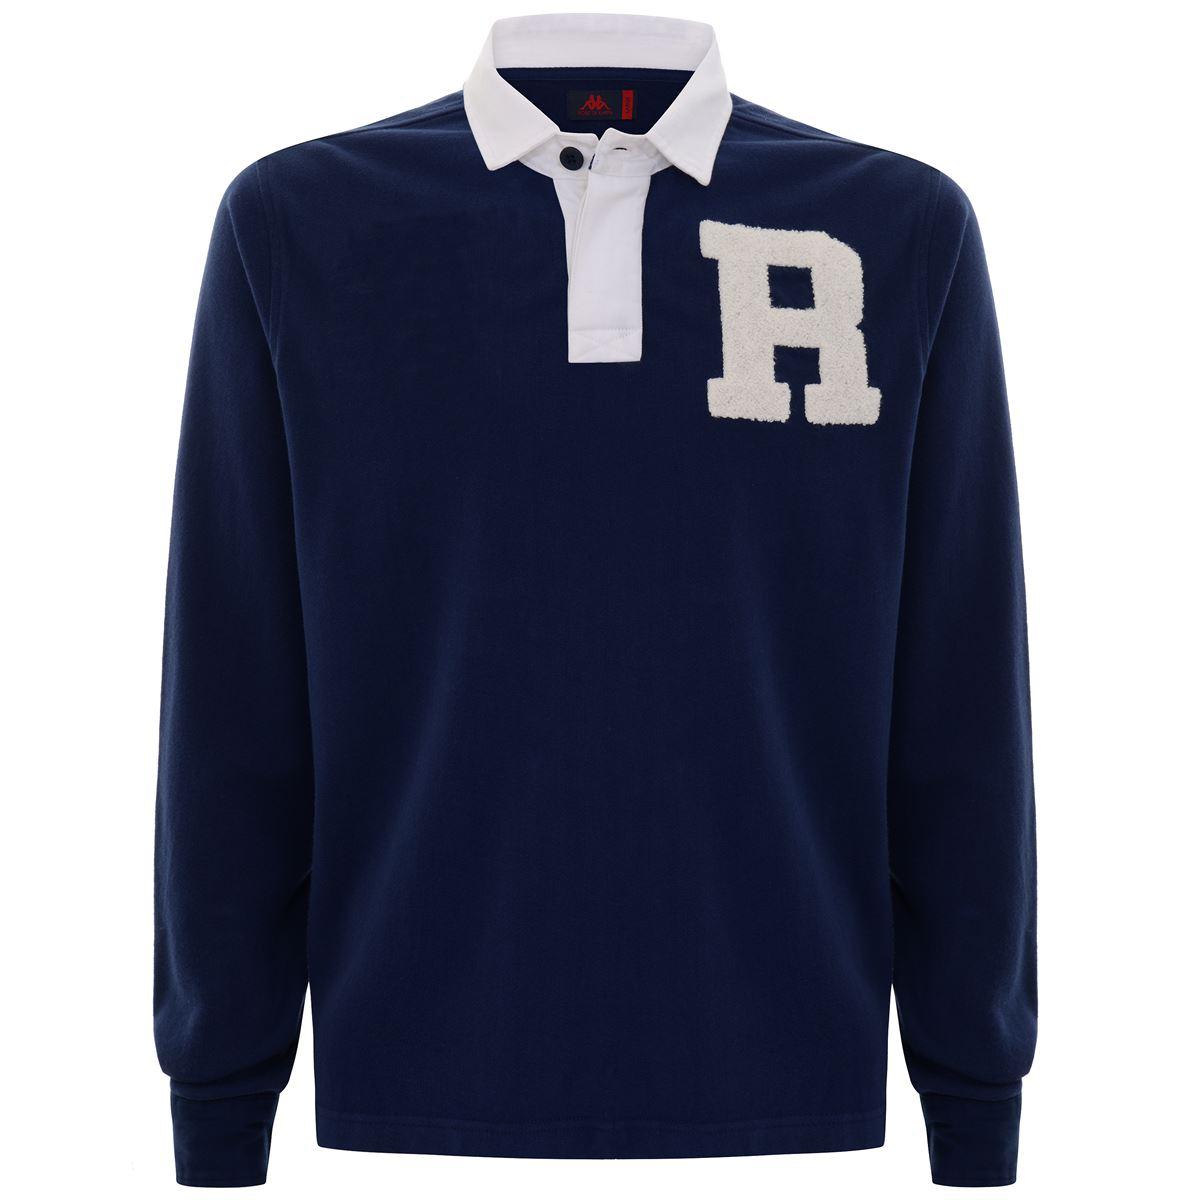 Robe di Kappa Polo Shirts uomo-6111B4W